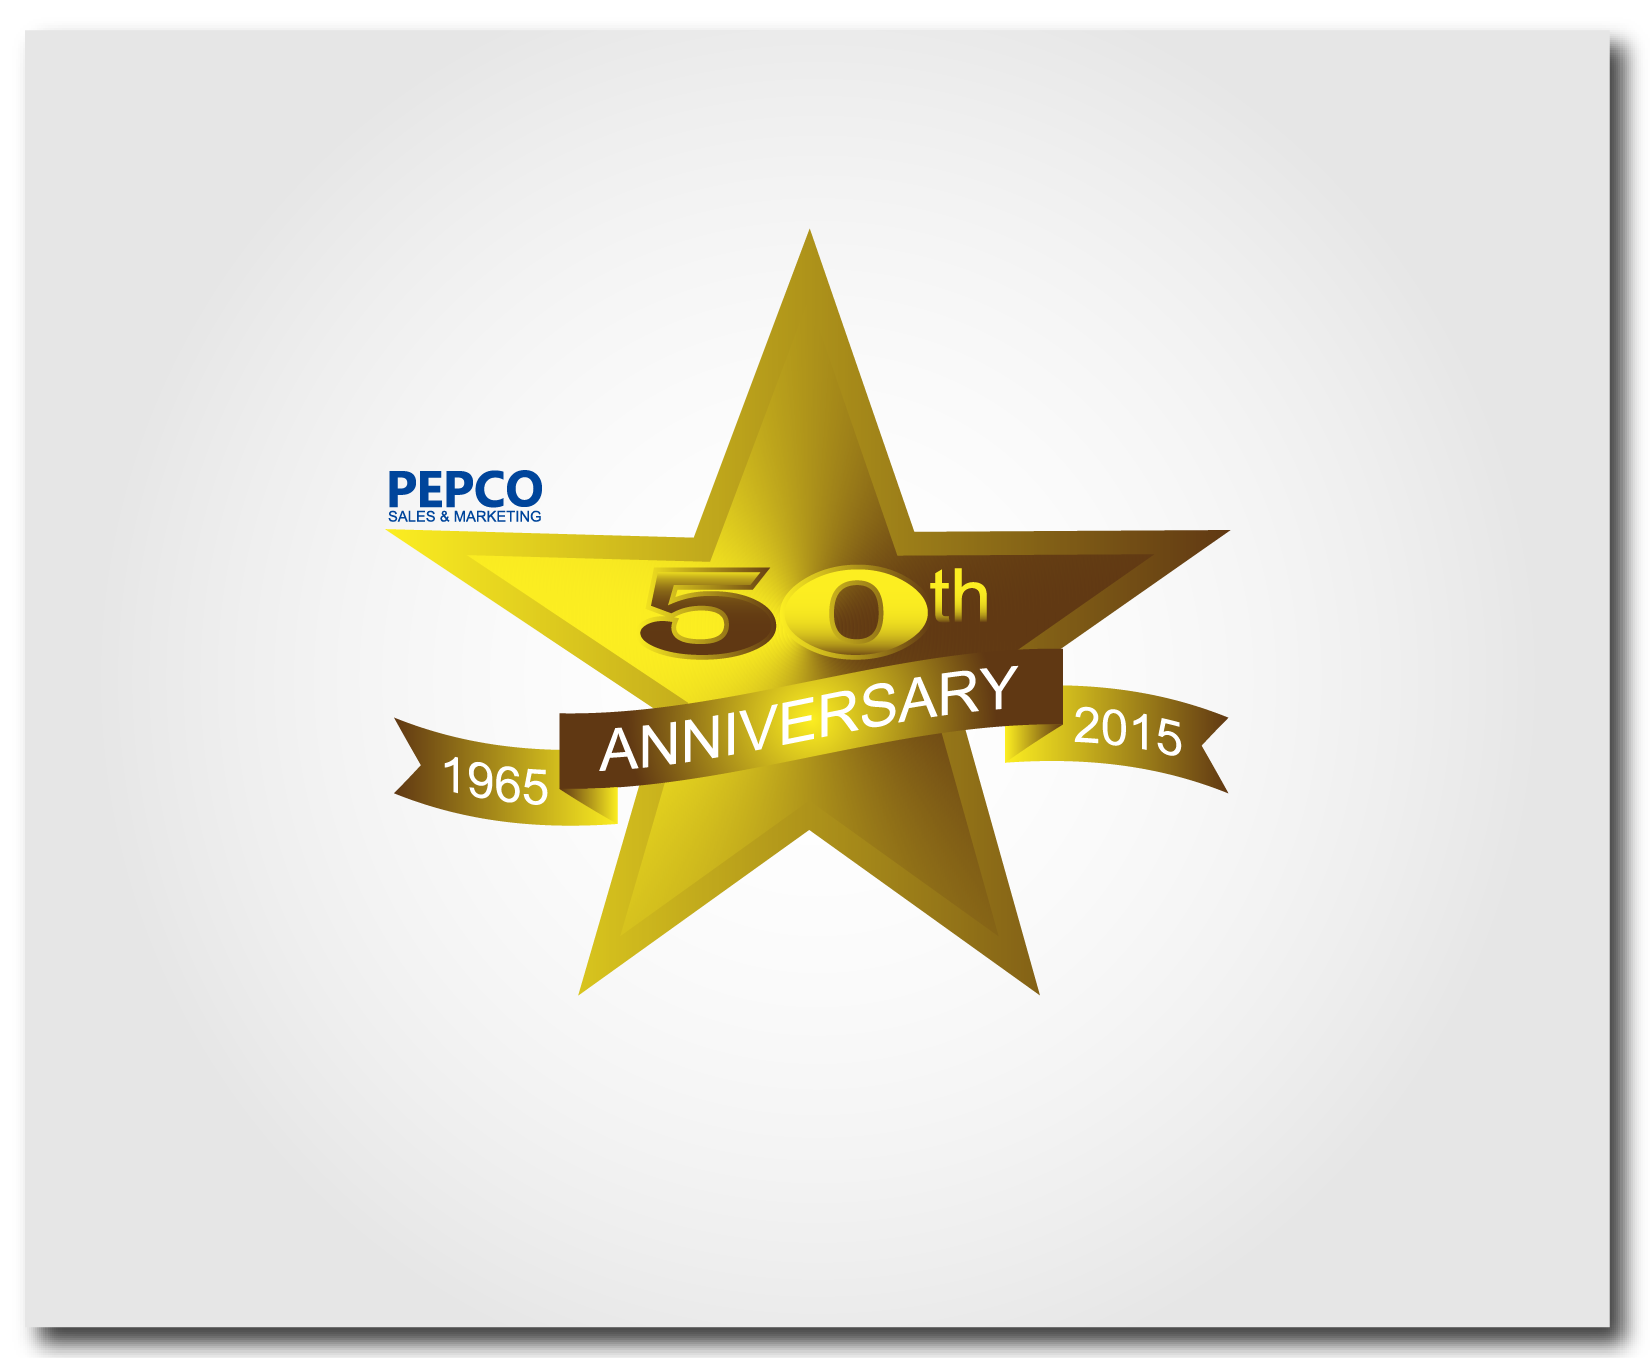 Logo Design Contests » 50th Anniversary Logo Design for